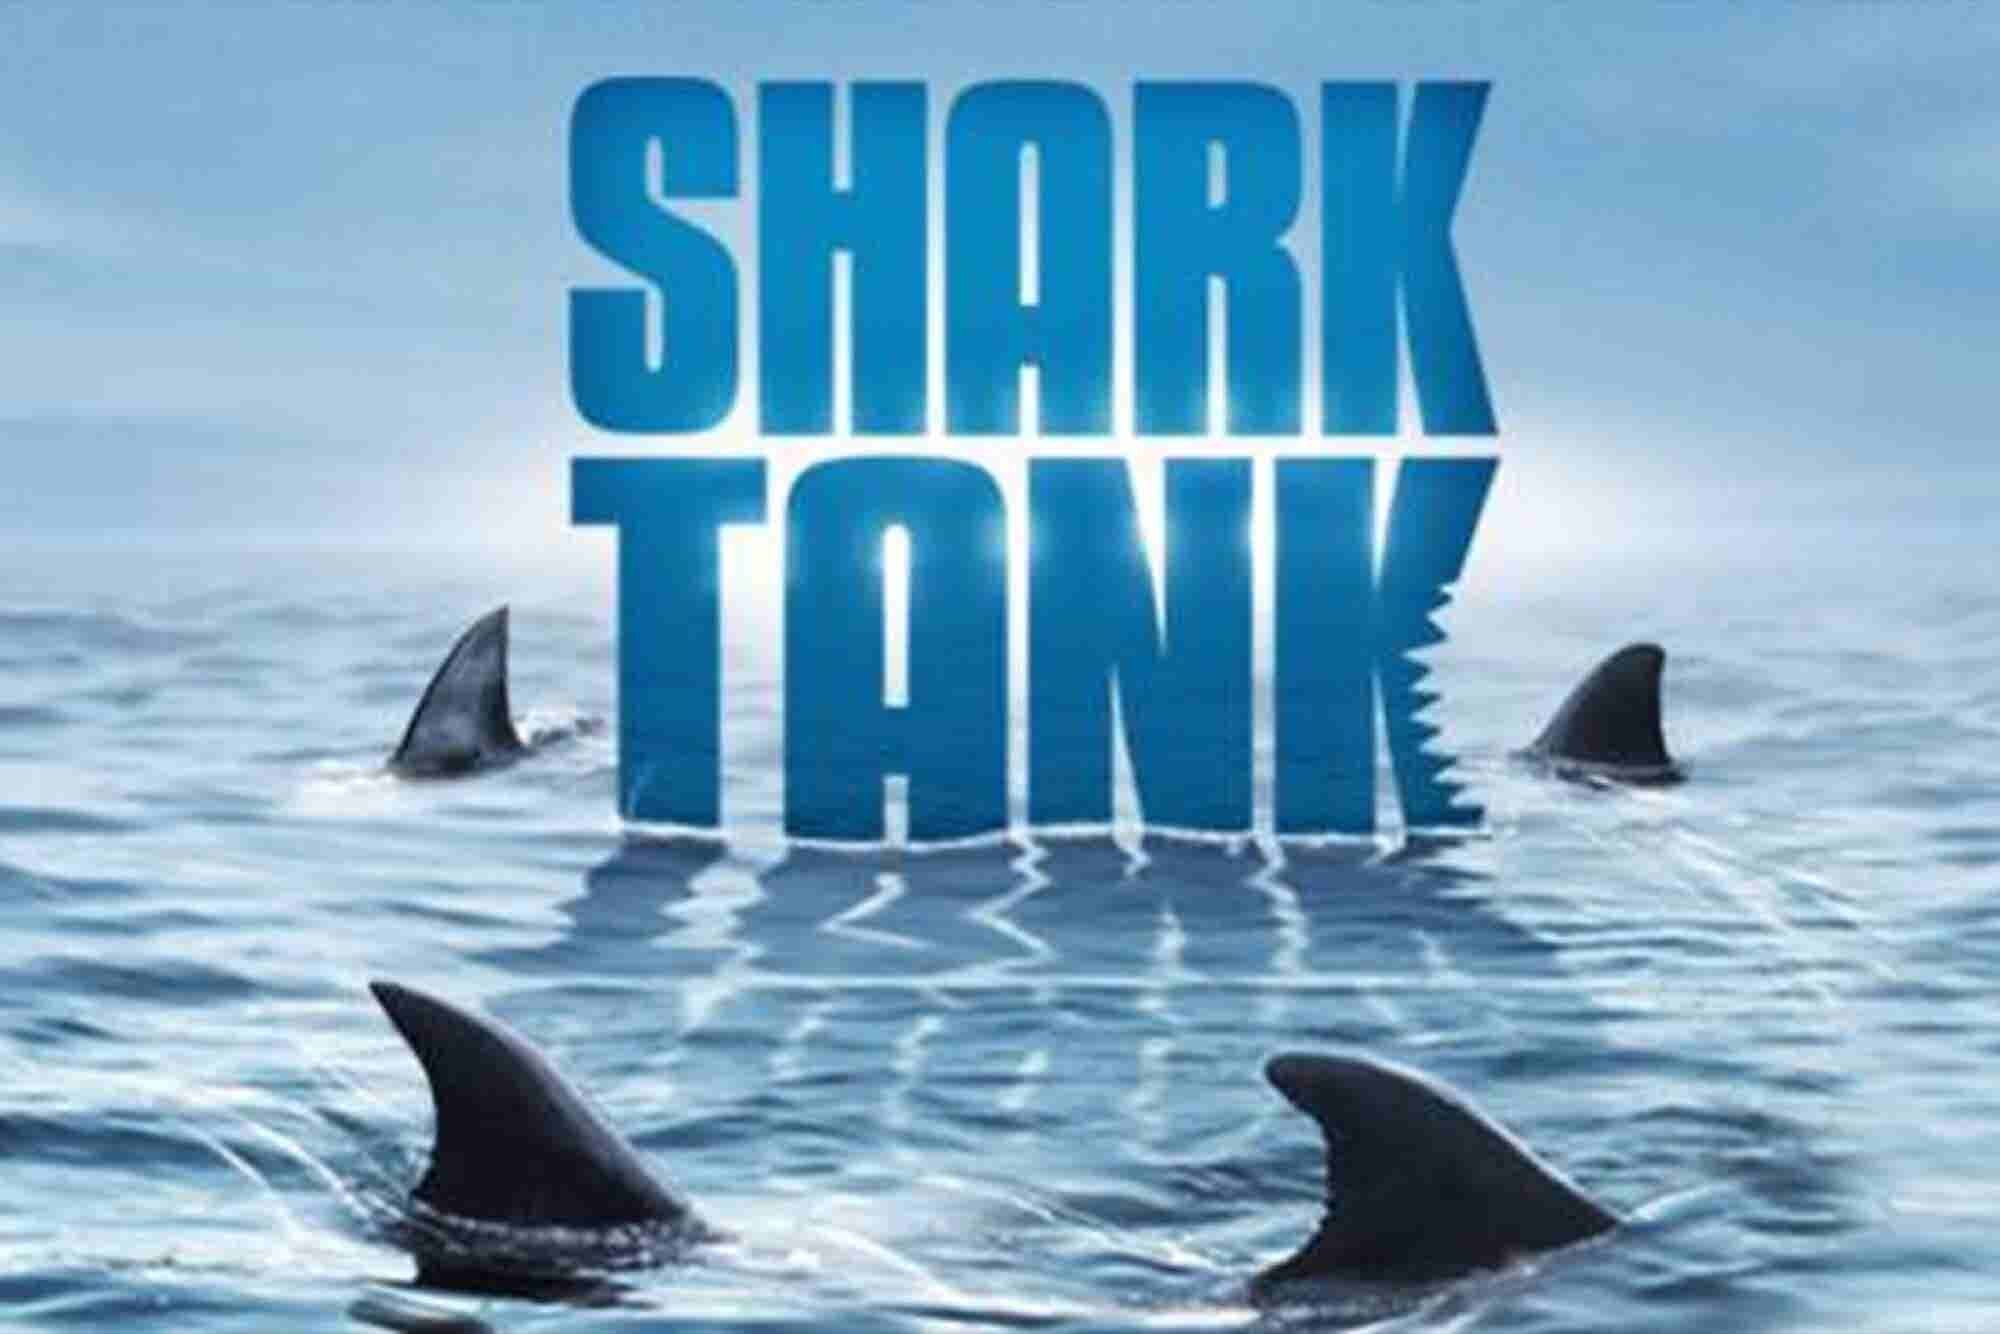 Meet the New Shark Tank Sharks: Ashton Kutcher, Chris Sacca